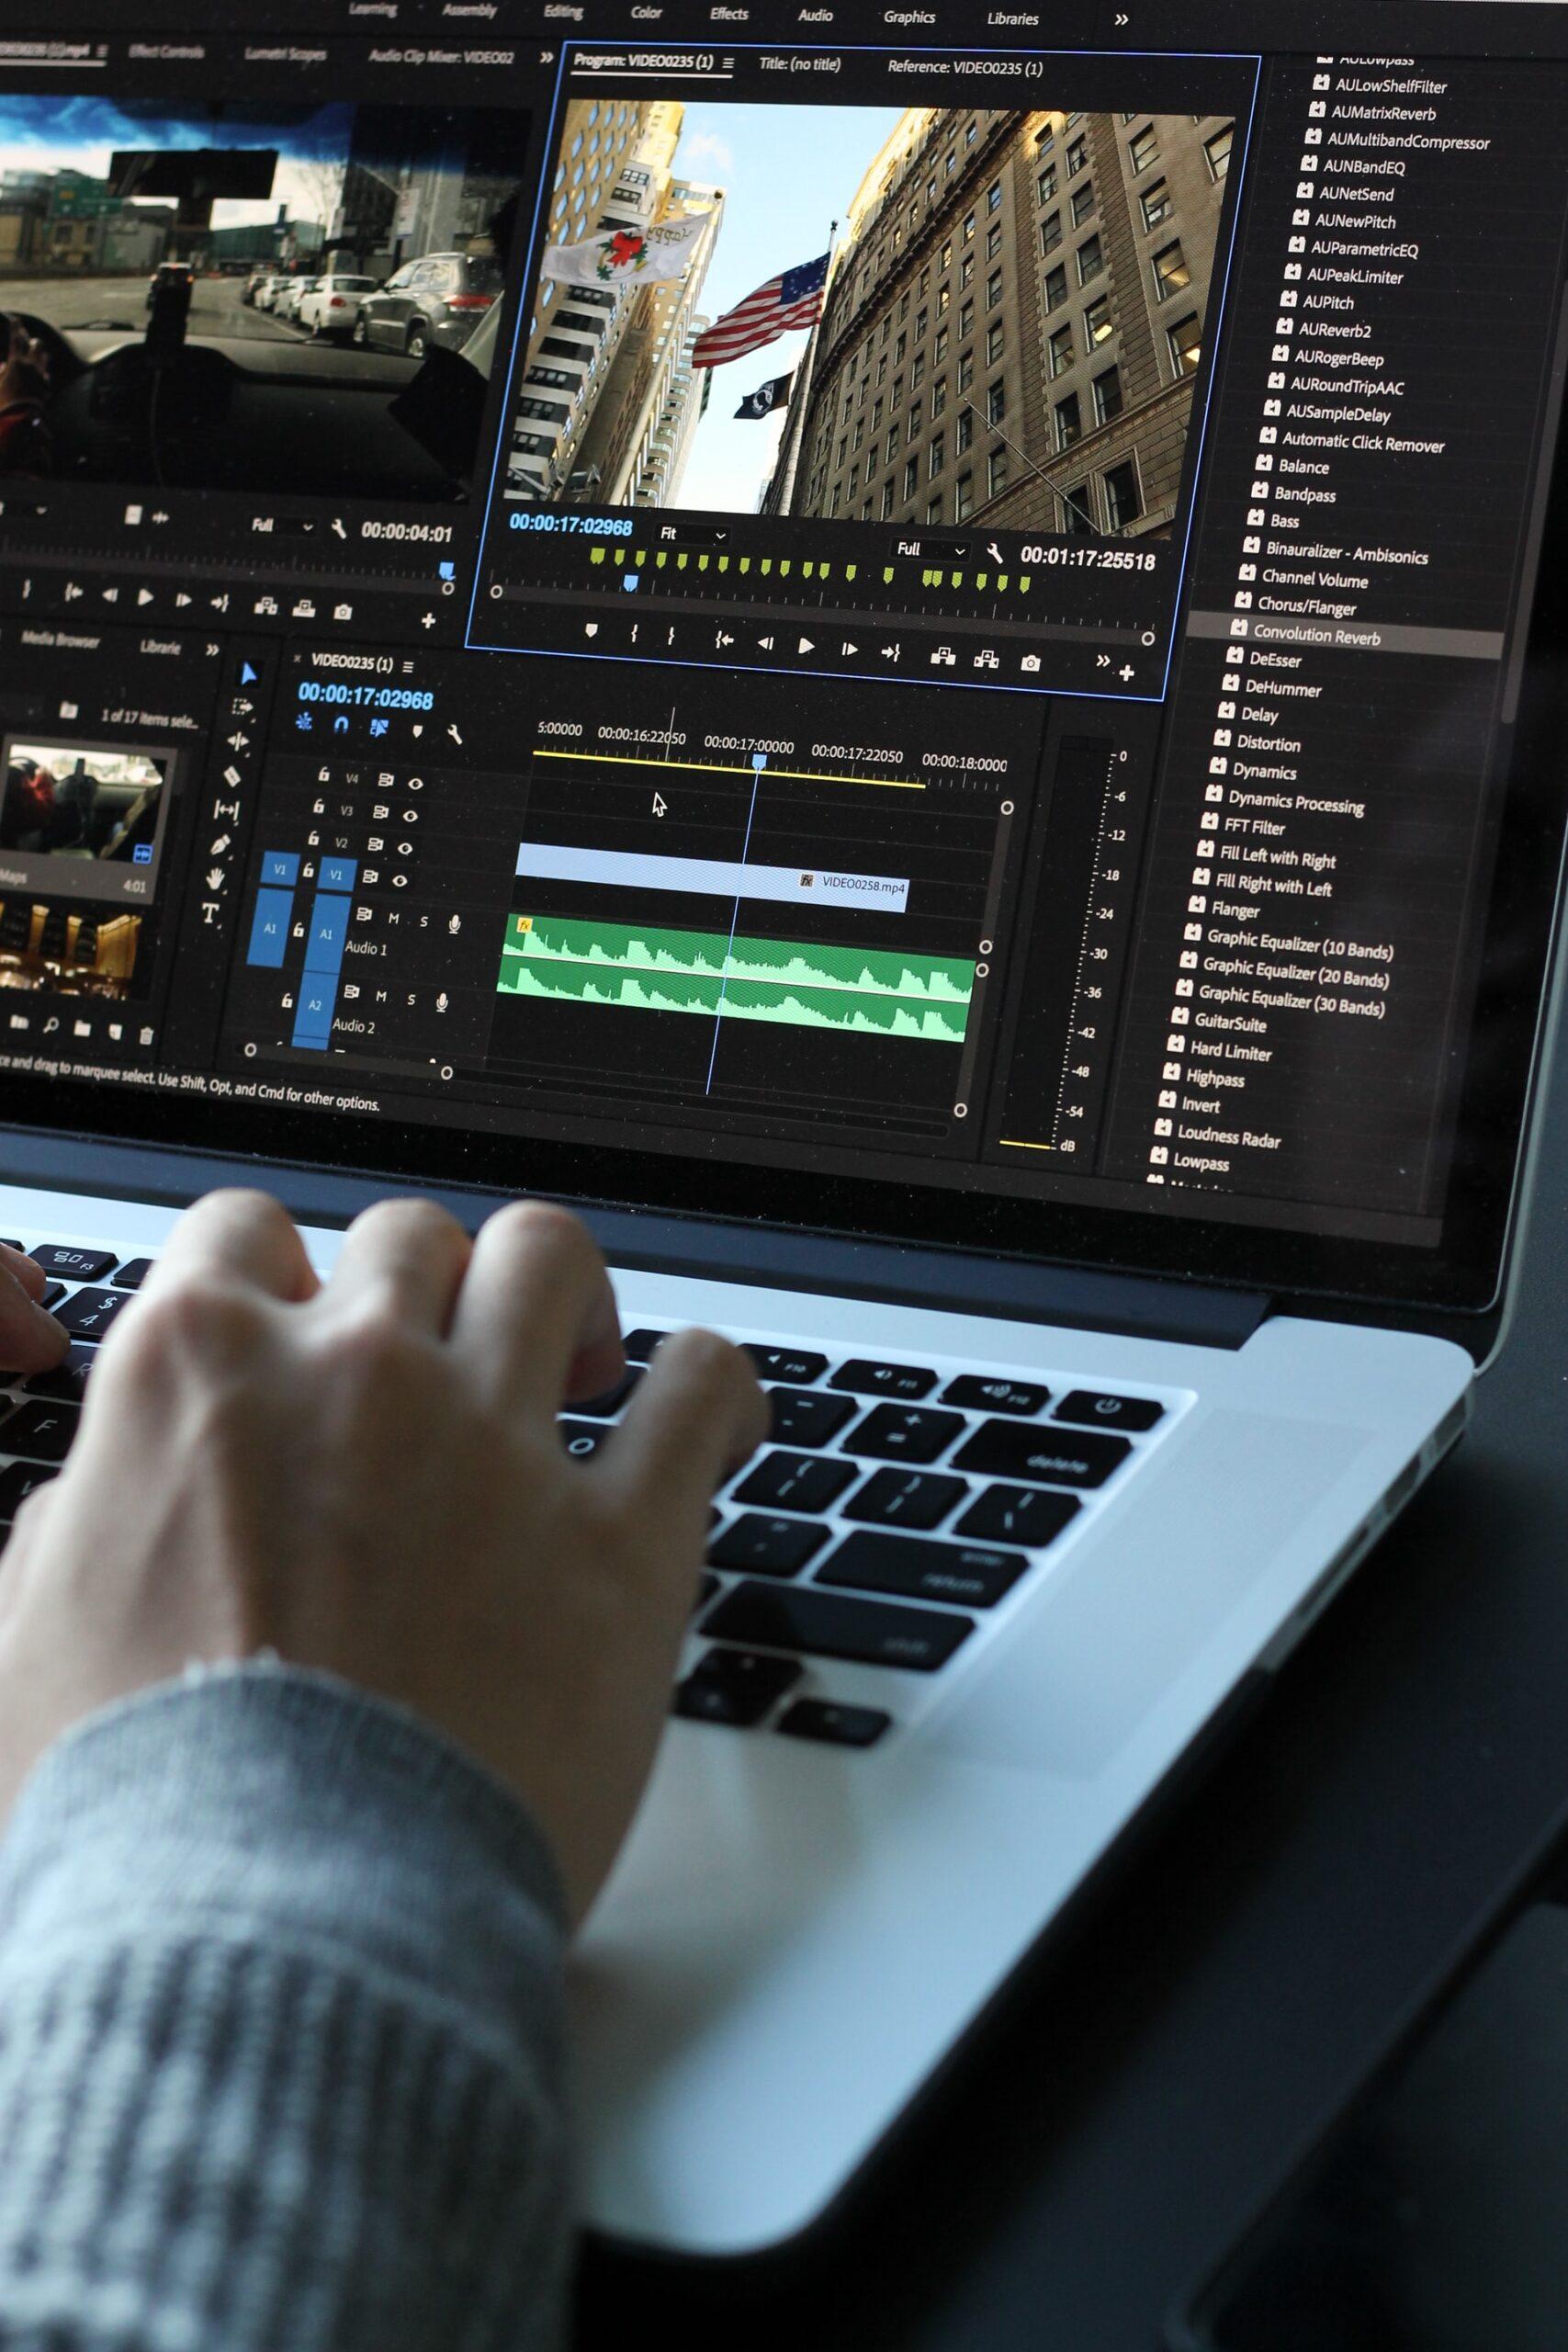 Editing on mac